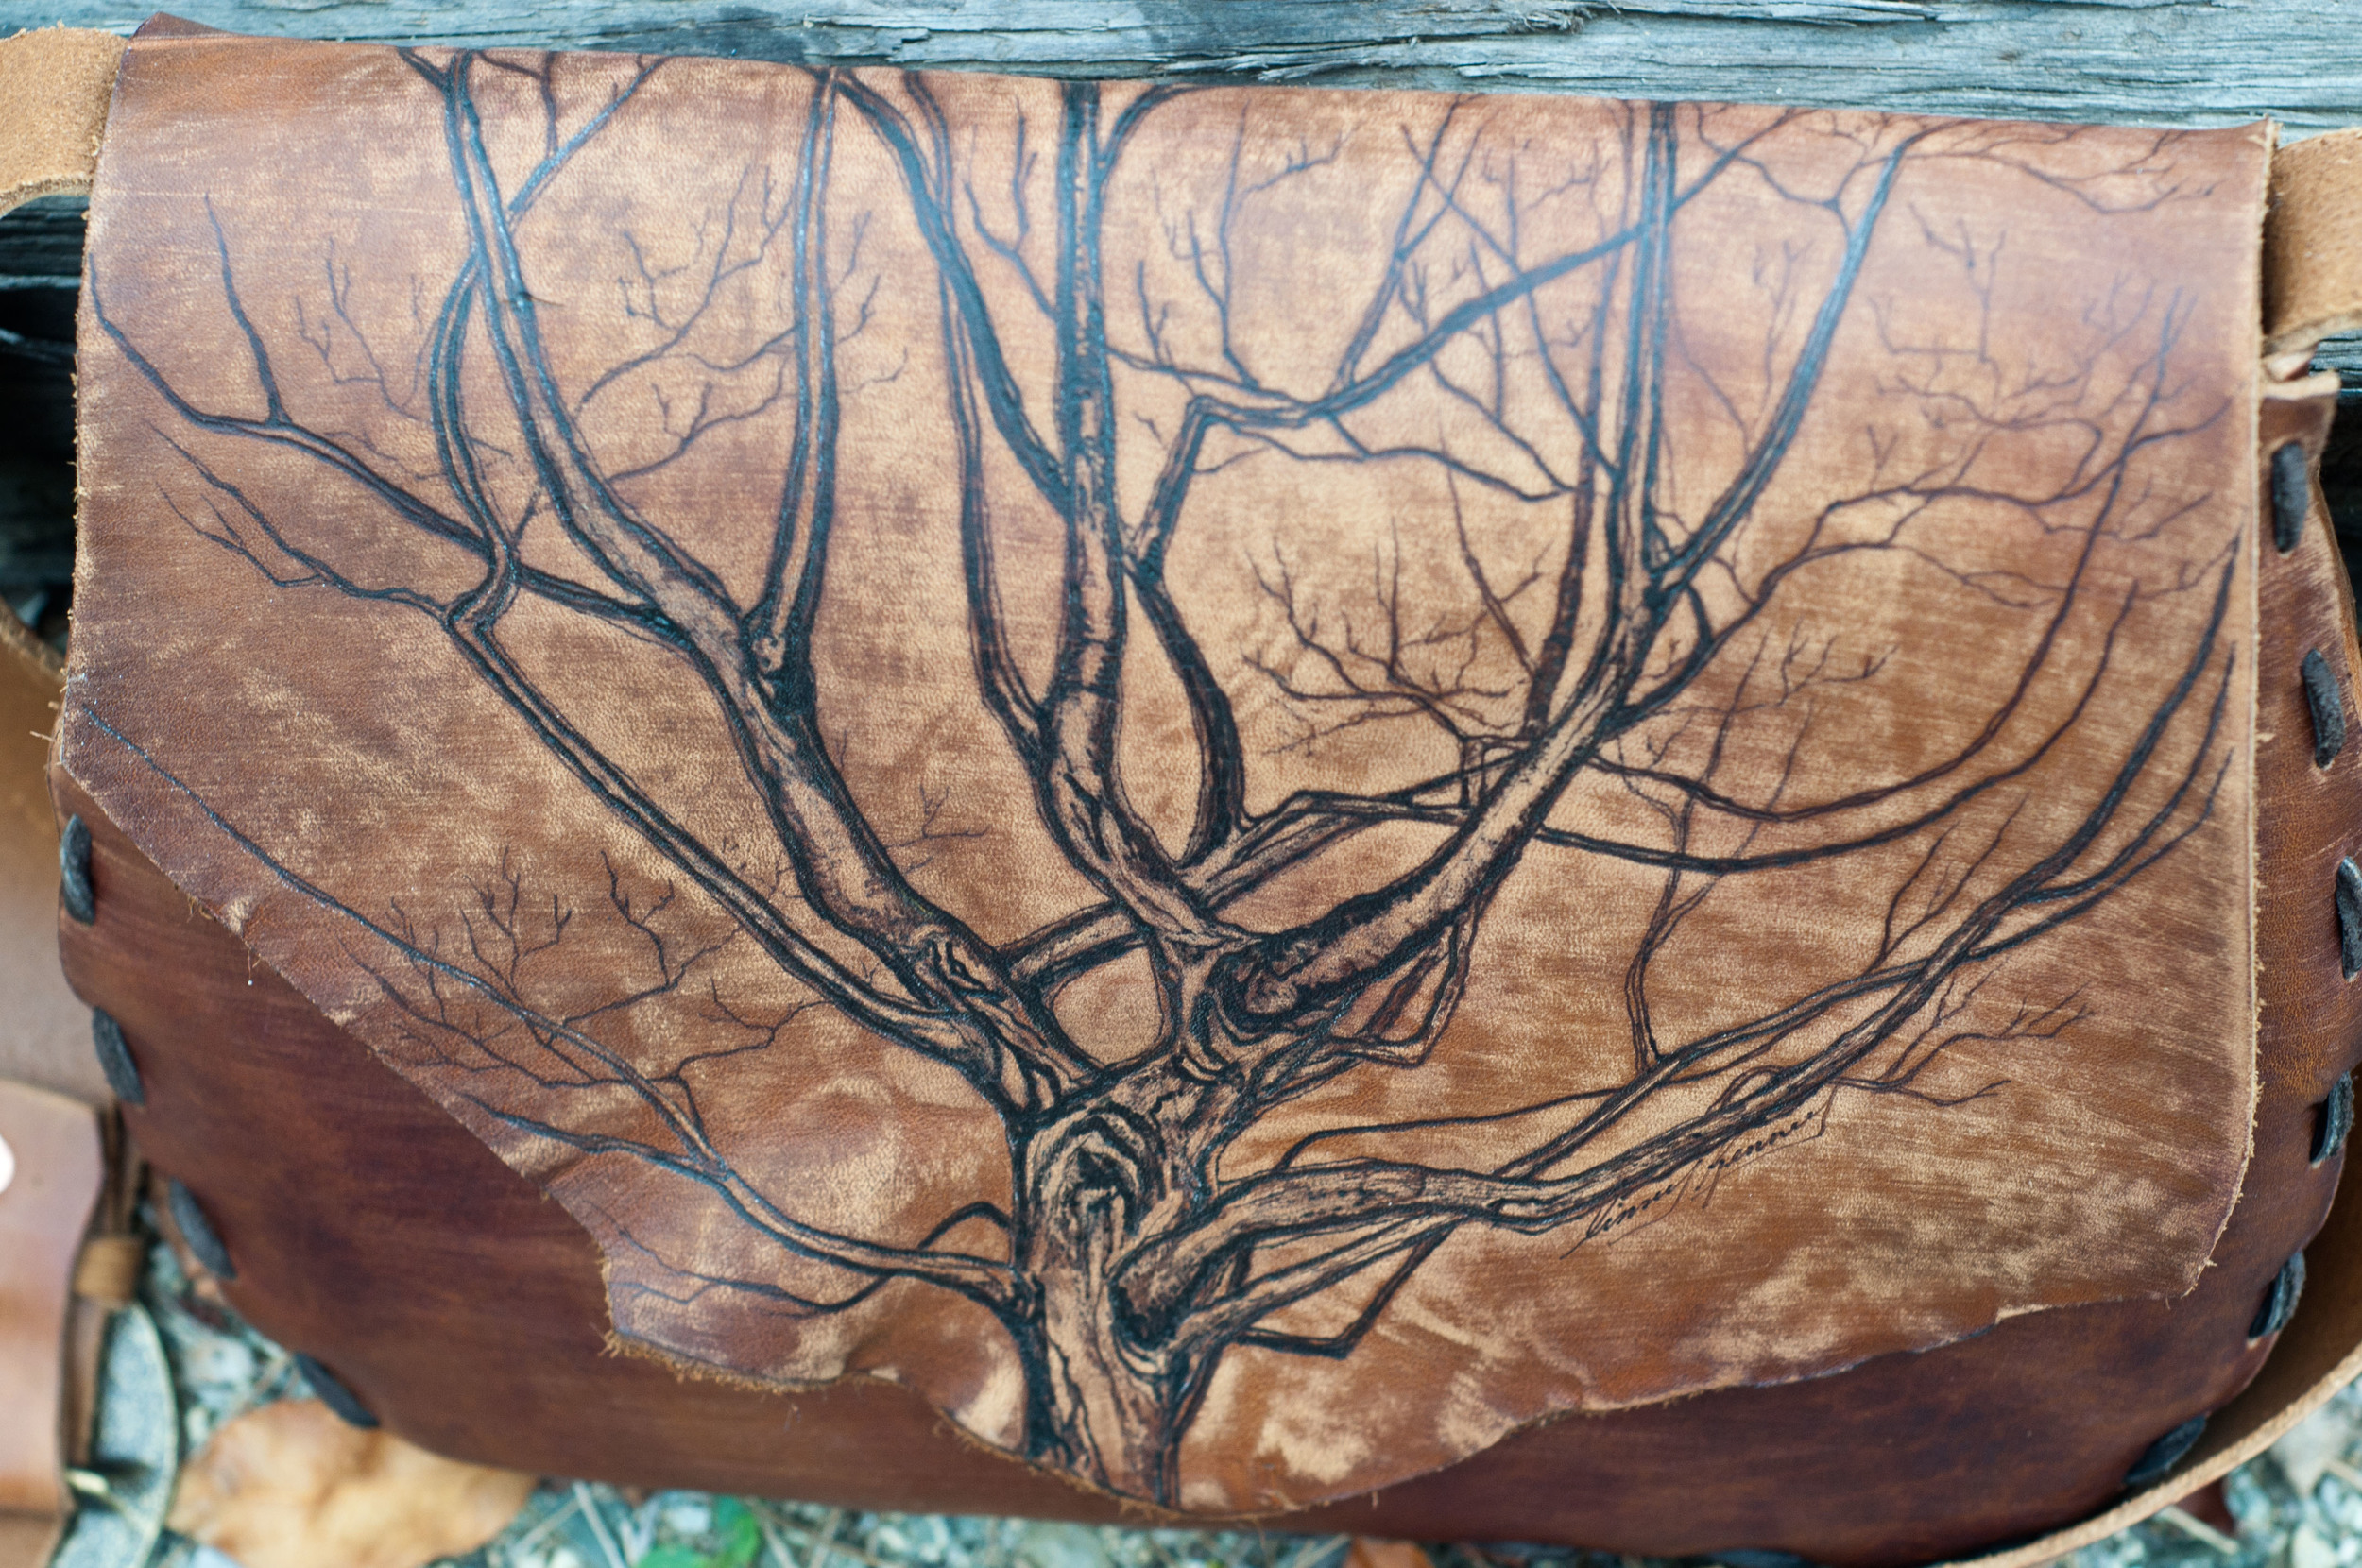 Thrive Like Something Wild Leather Bag